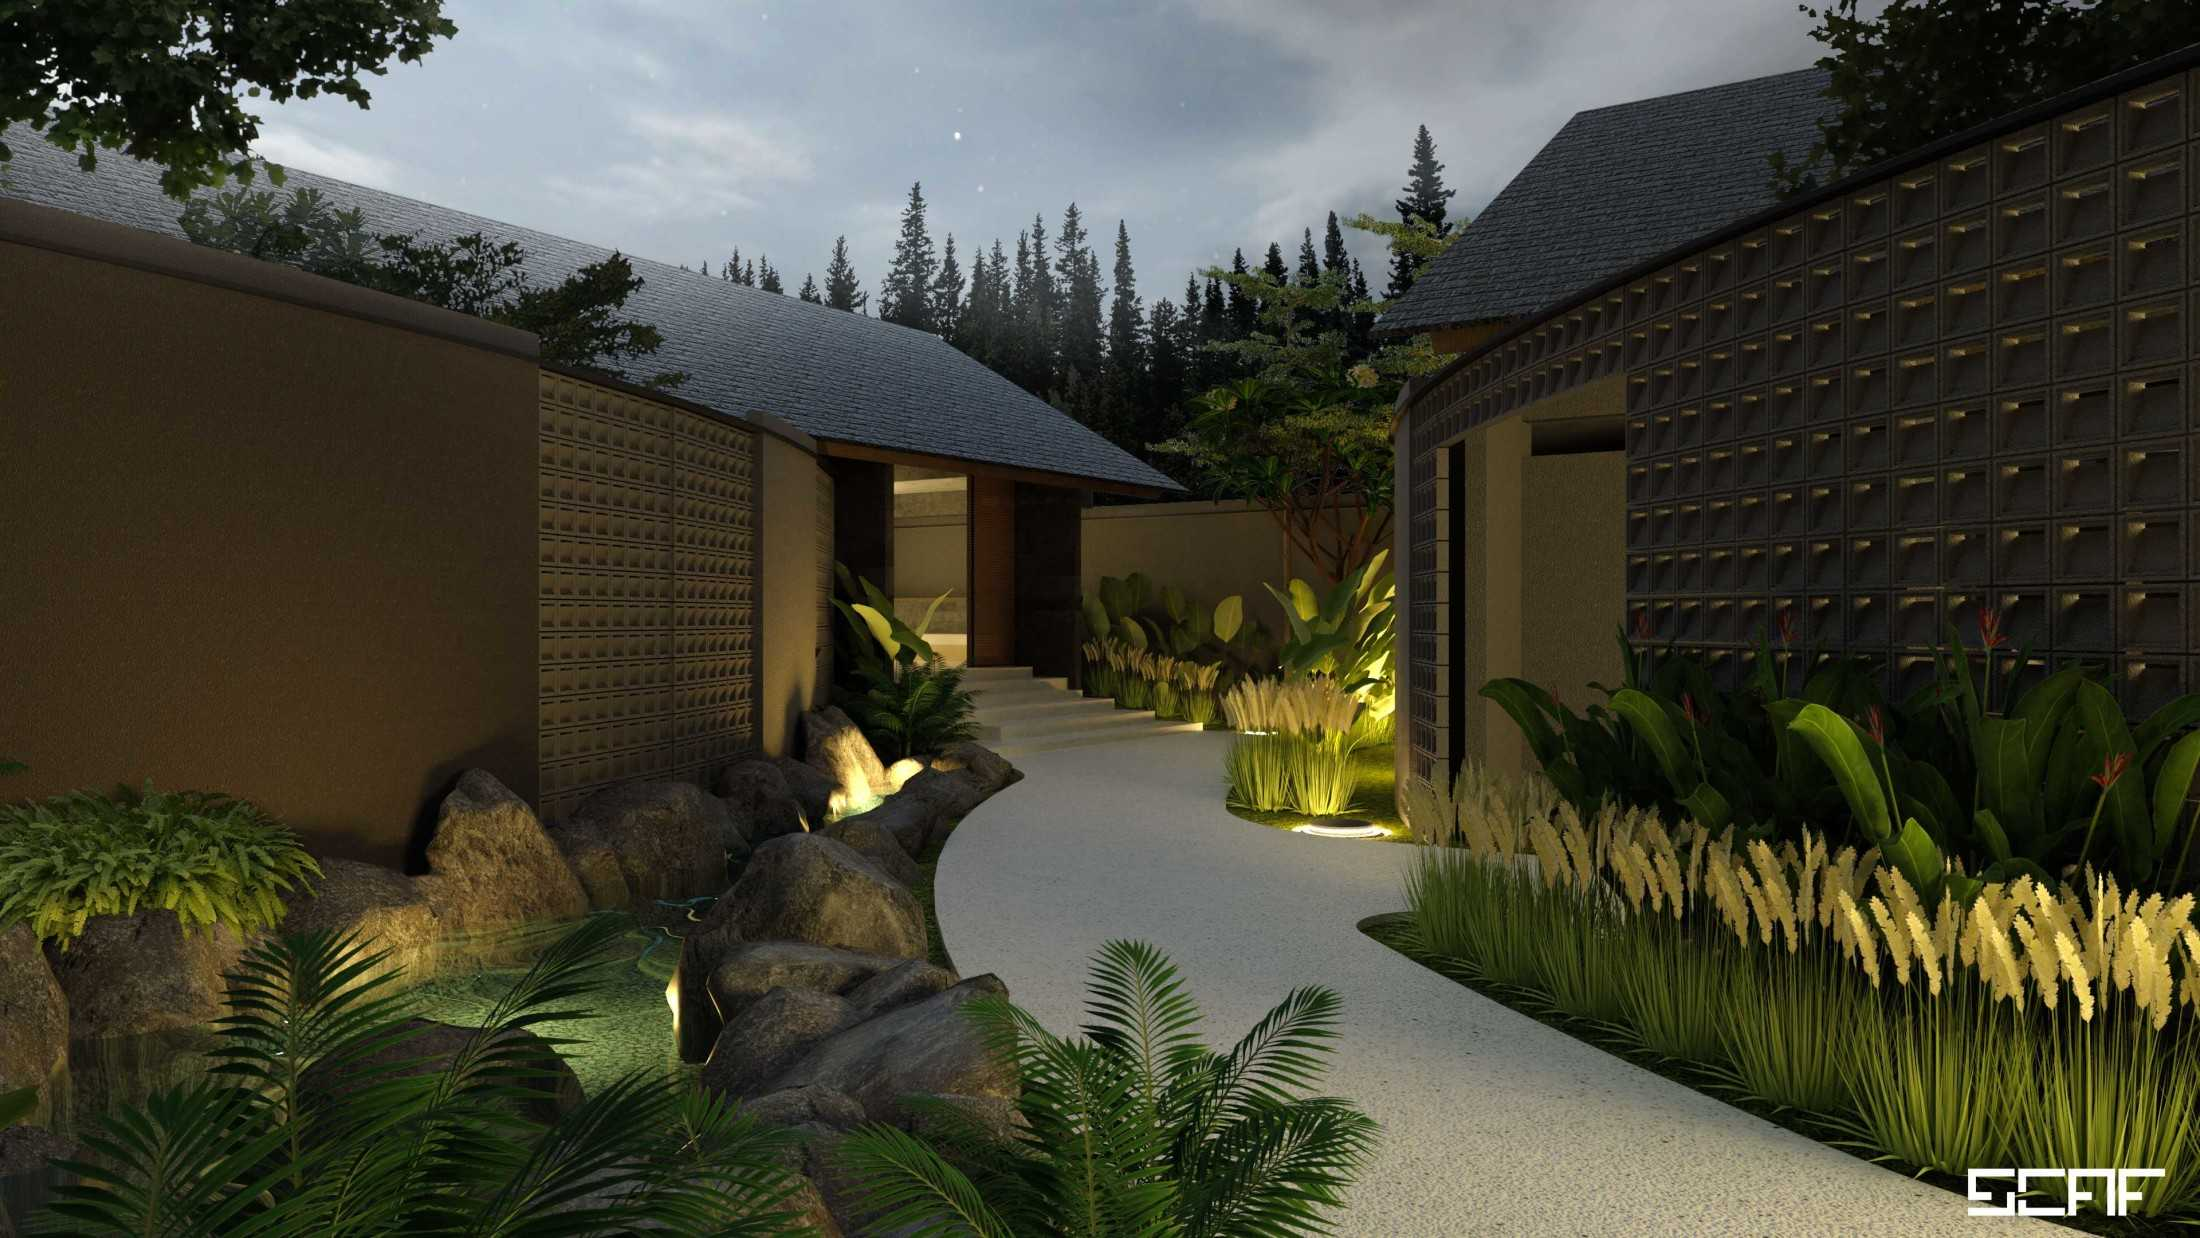 Scaf Studio Villa Rayung Cisarua, Kec. Cisarua, Bogor, Jawa Barat, Indonesia Cisarua, Kec. Cisarua, Bogor, Jawa Barat, Indonesia Scaf-Studio-Villa-Rayung Tropical 121764